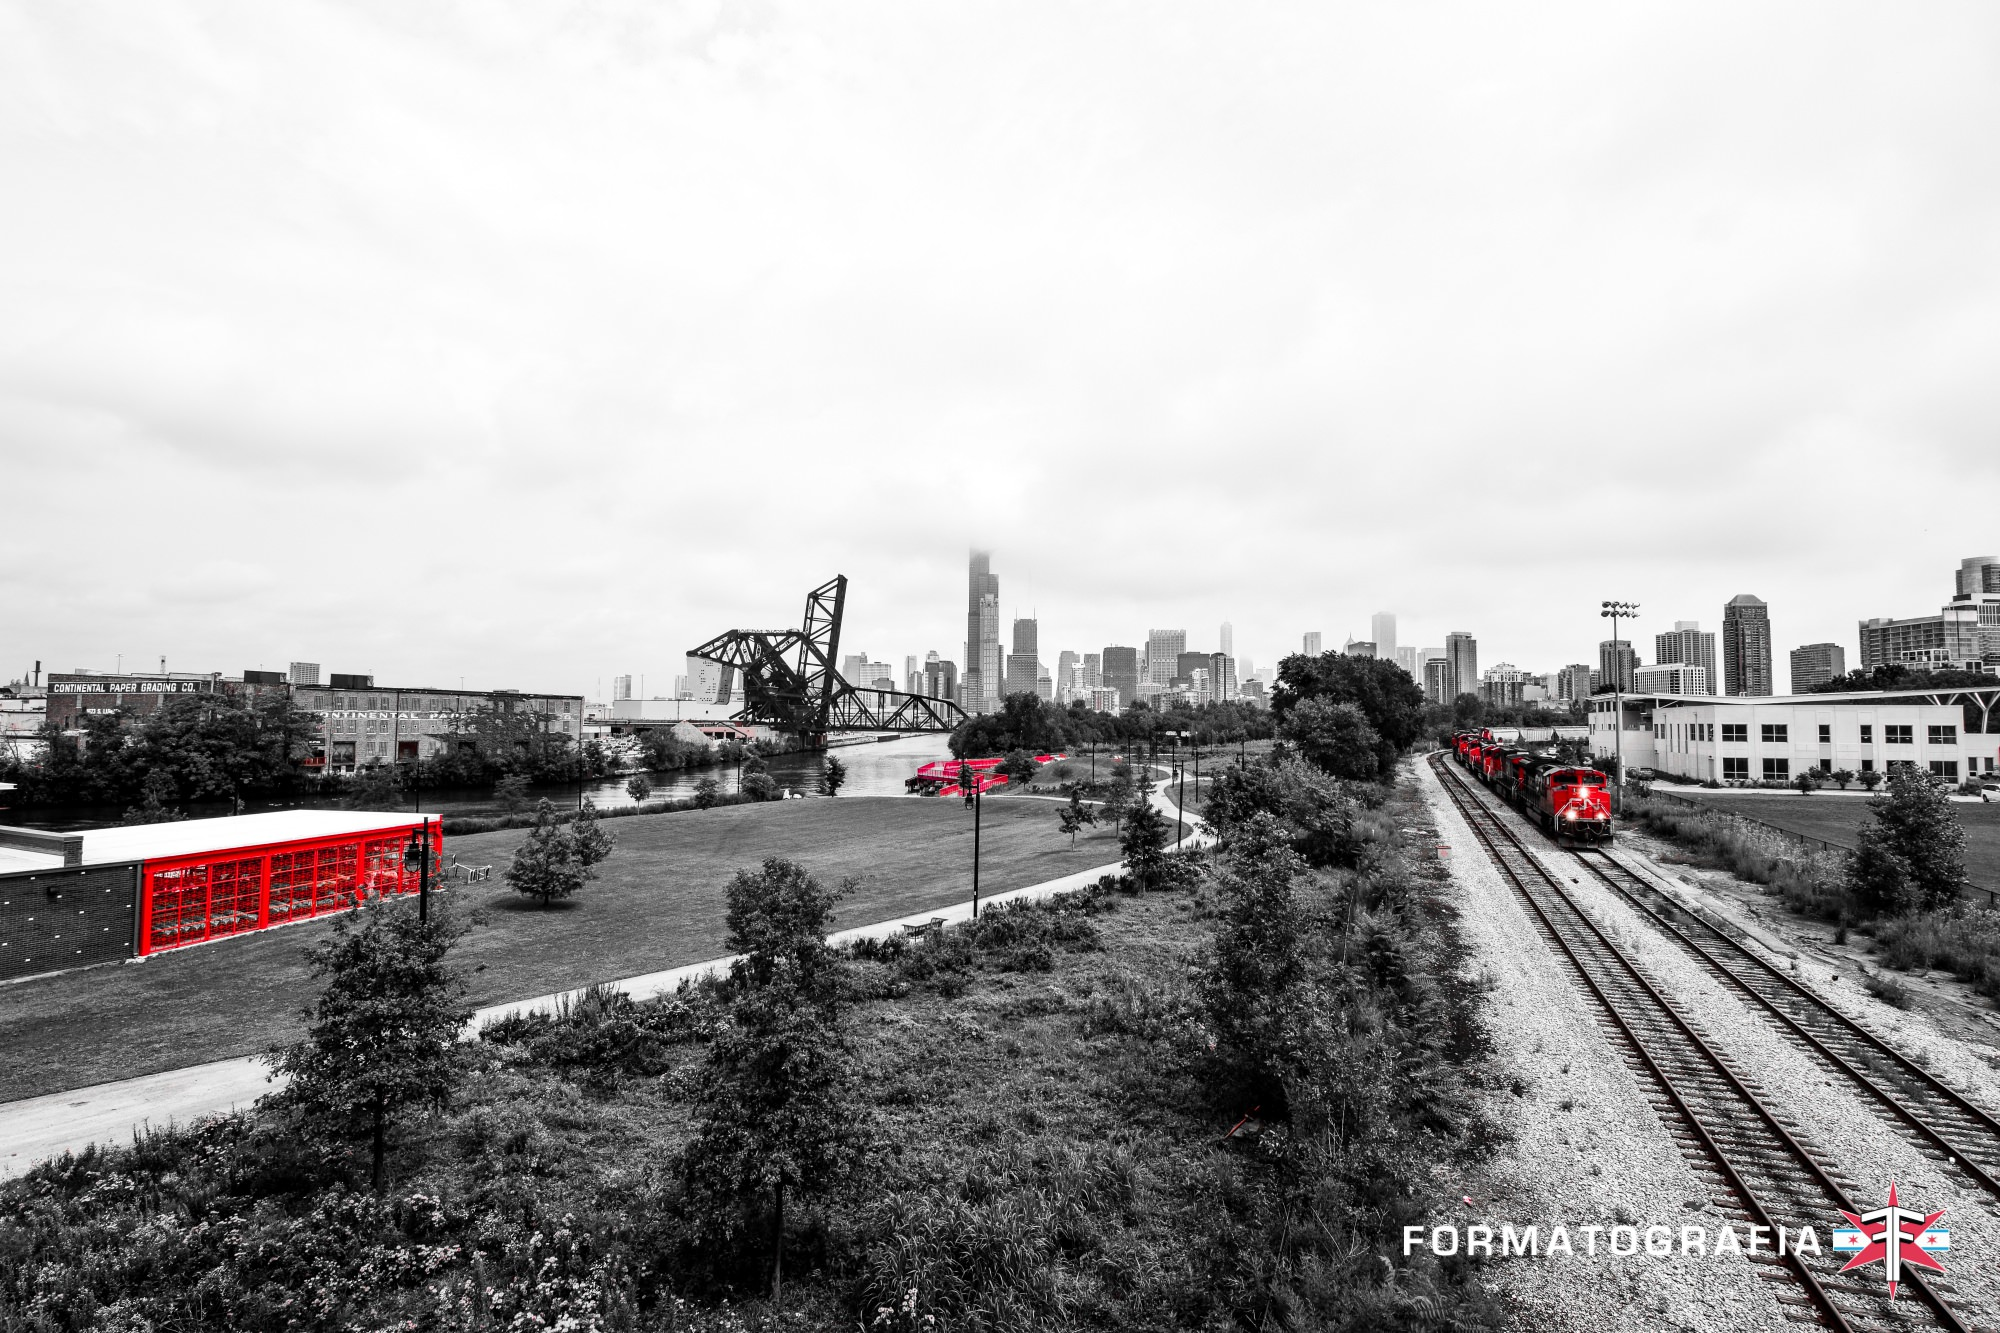 eric formato chicago photographer fall update city architecture shotsDSC_0203.jpg